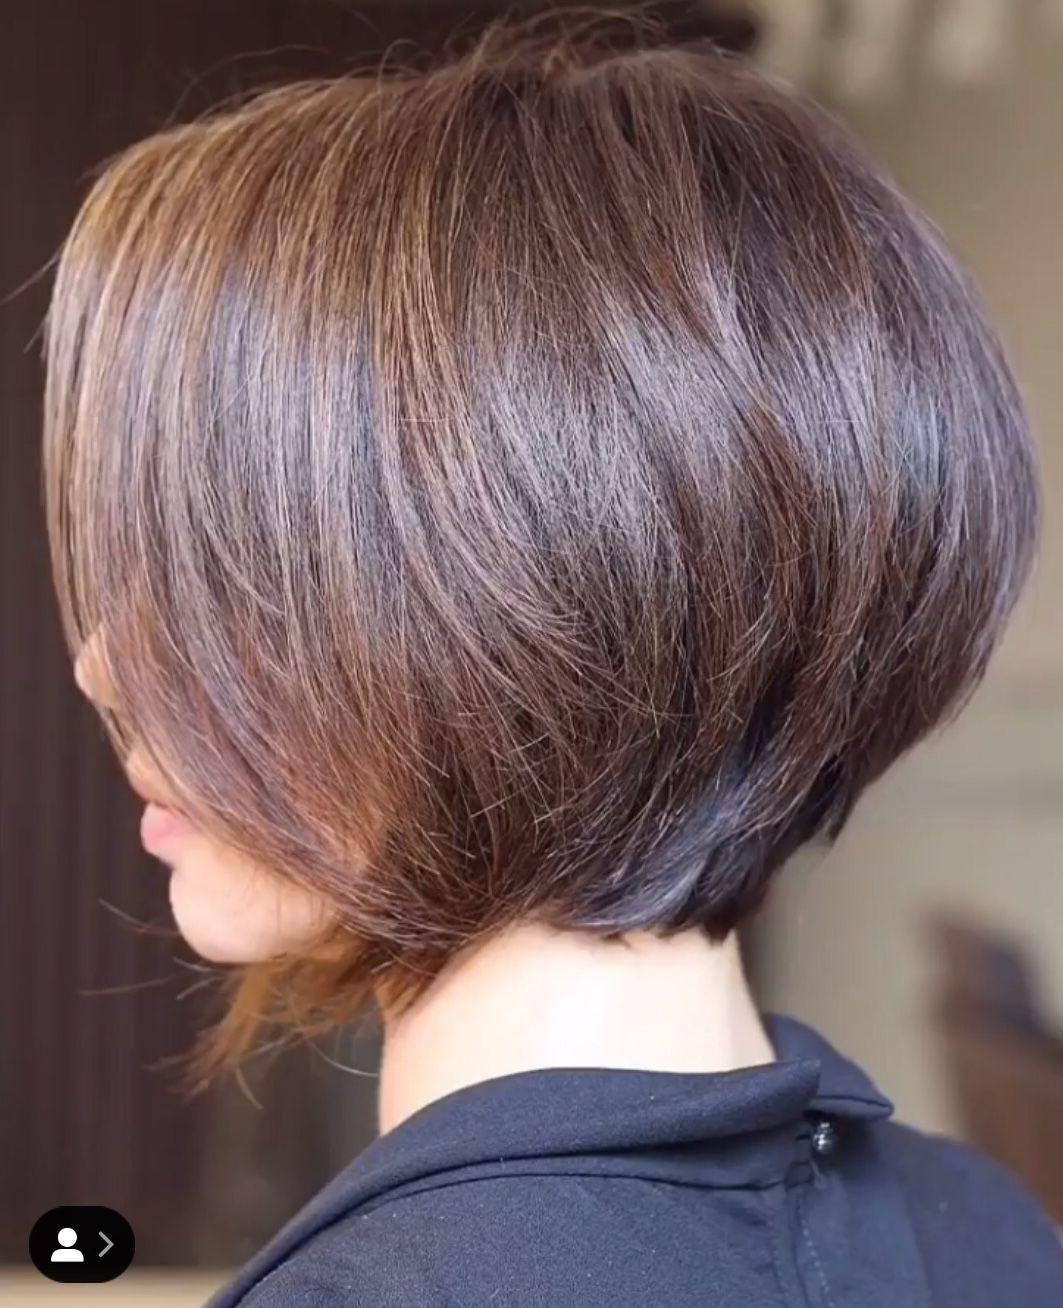 Women Haircut Medium Fine Hair Women Haircut Medium Kapsels Voor Kort Haar Kort Haar Kapsels Fijn Haar Kapsels